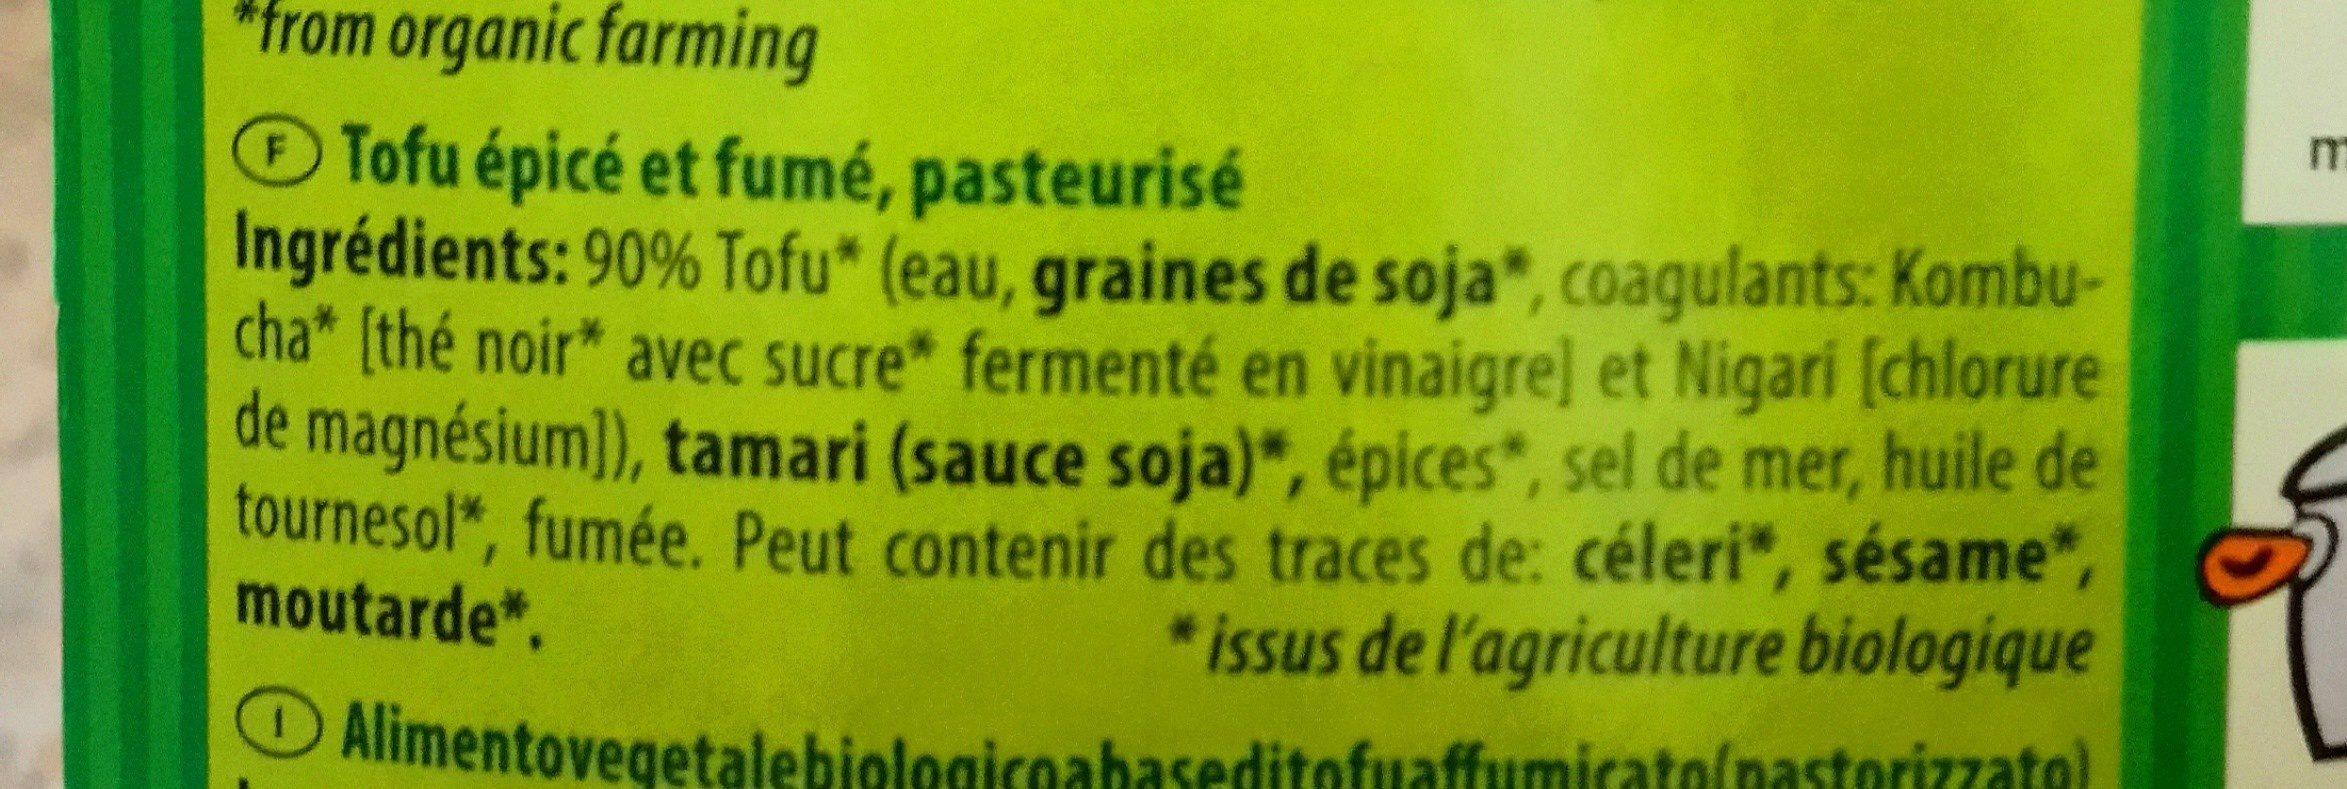 Specky Räucher-Tofu (fumé) - Ingredienti - fr